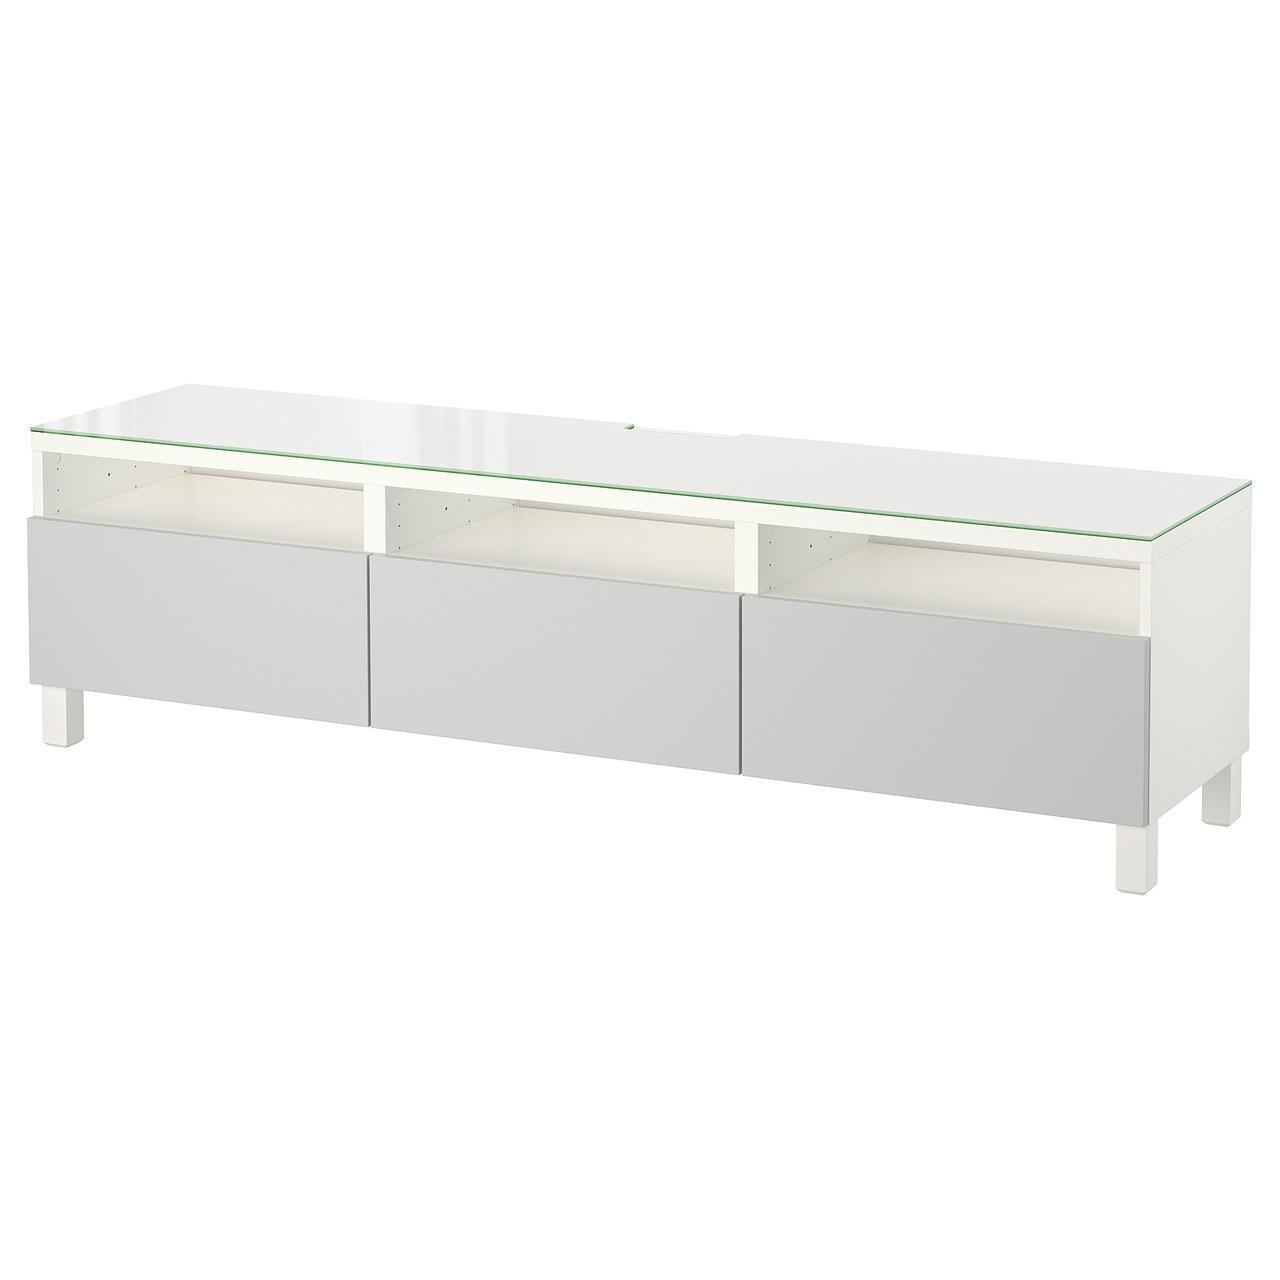 IKEA BESTA Тумба под телевизор с ящиками, белый, Лаппвикен светло-серый  (692.089.41)